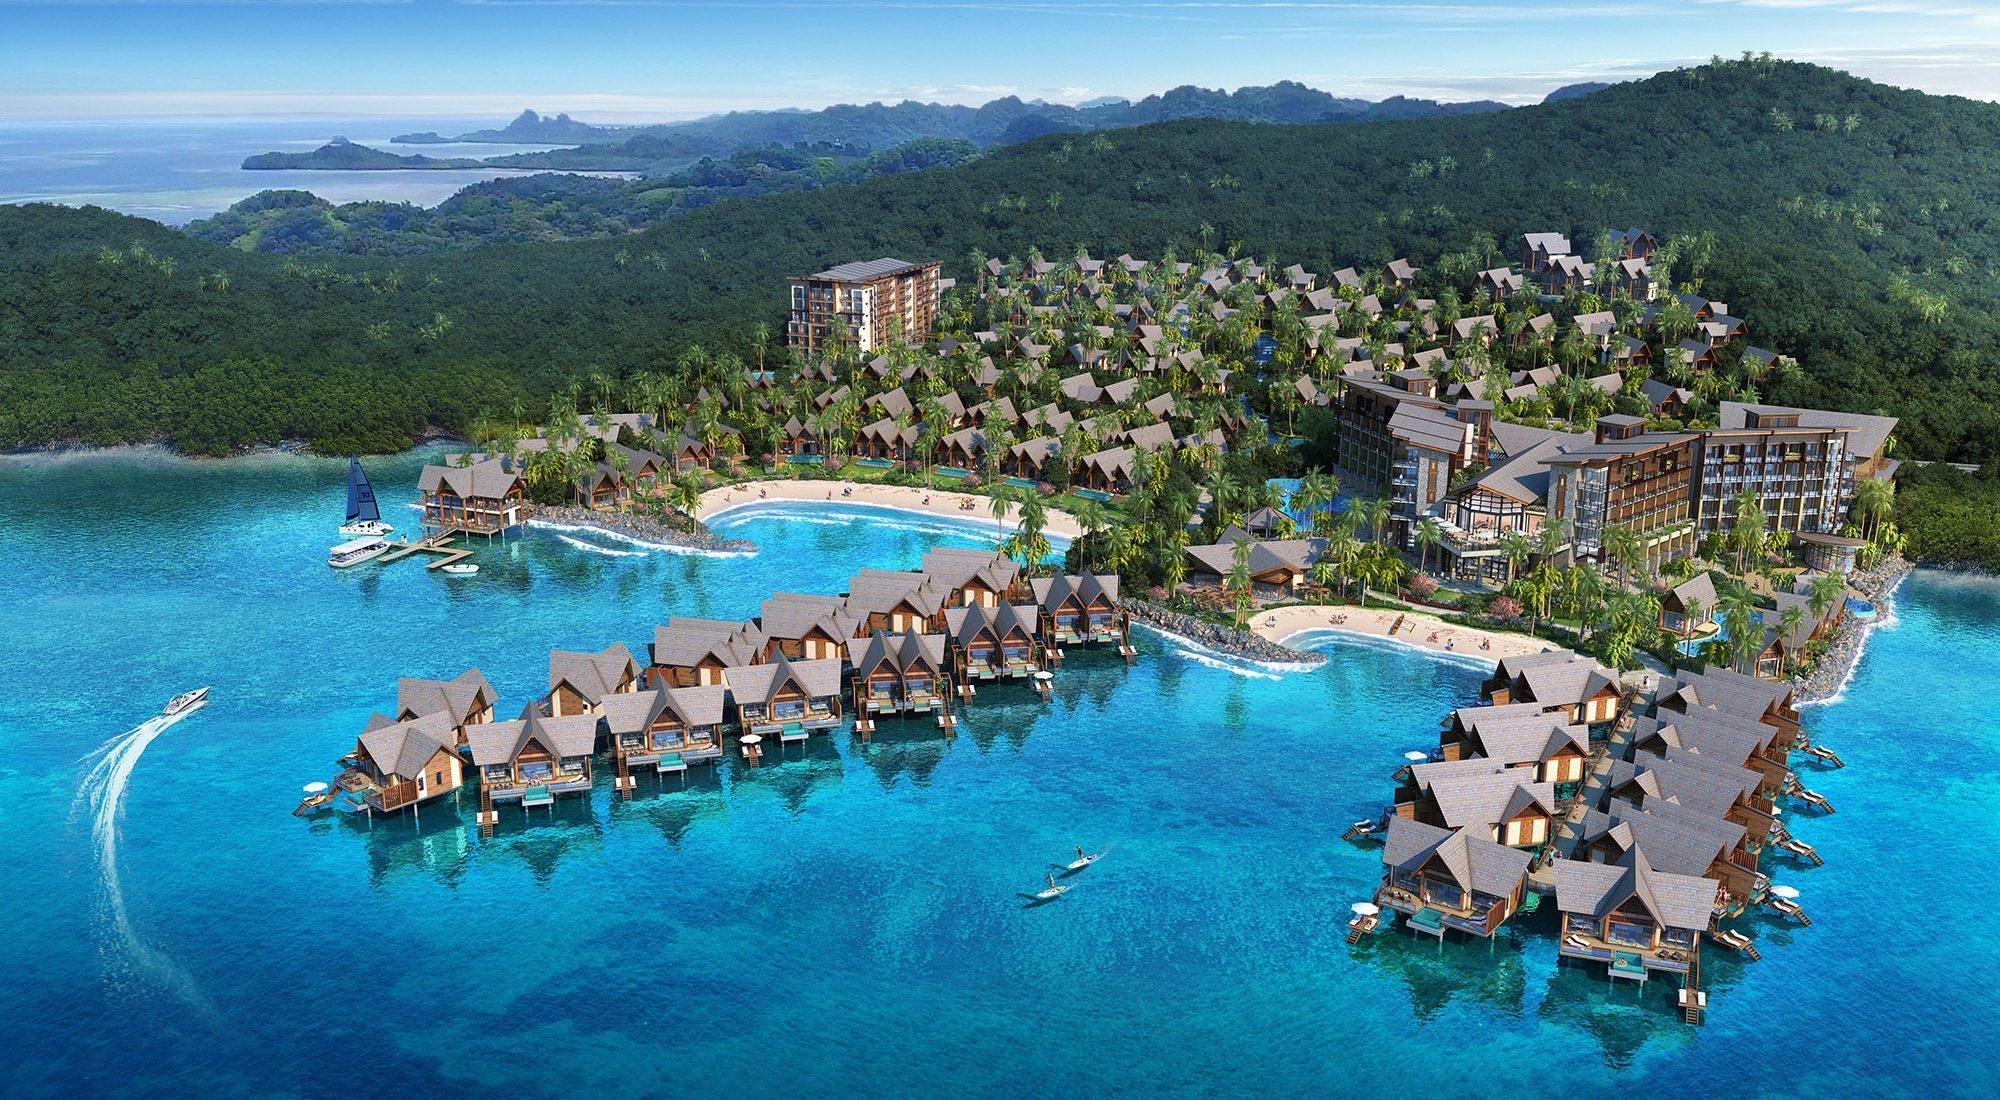 Wyndham Palau from above